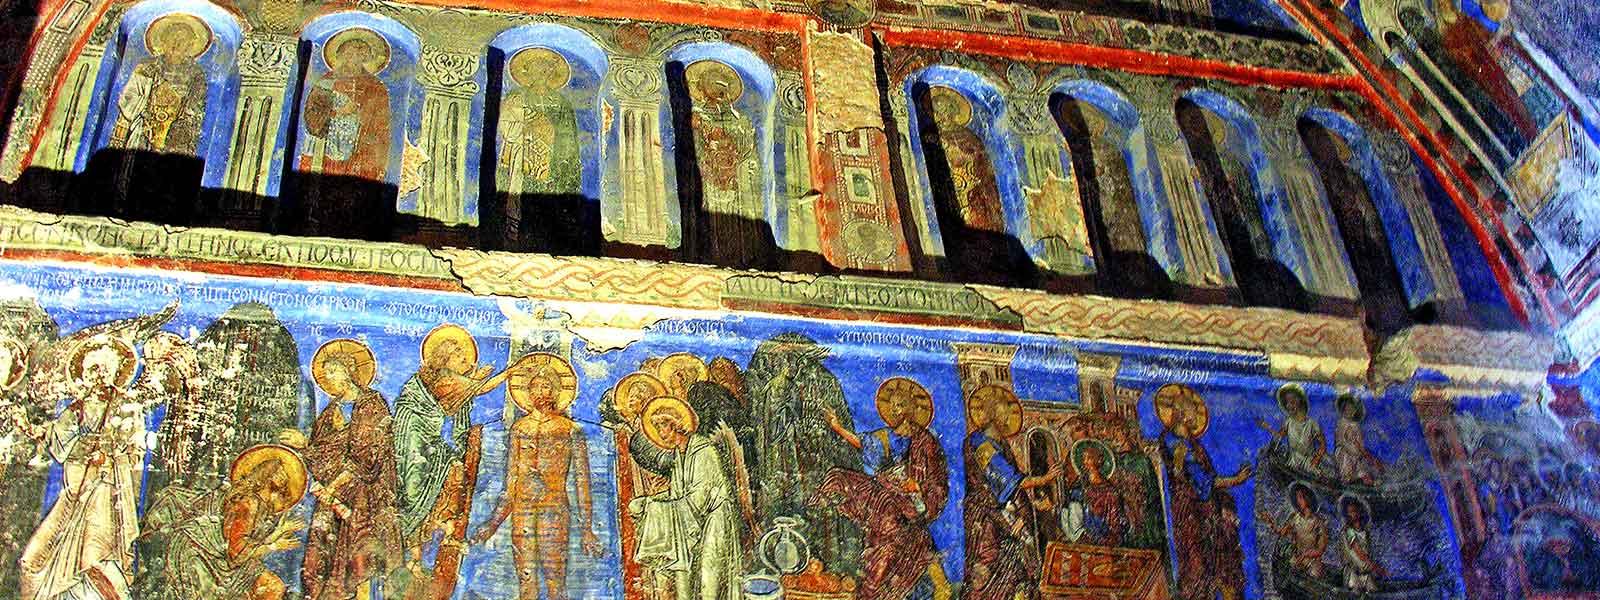 Buckle Church Cappadocia